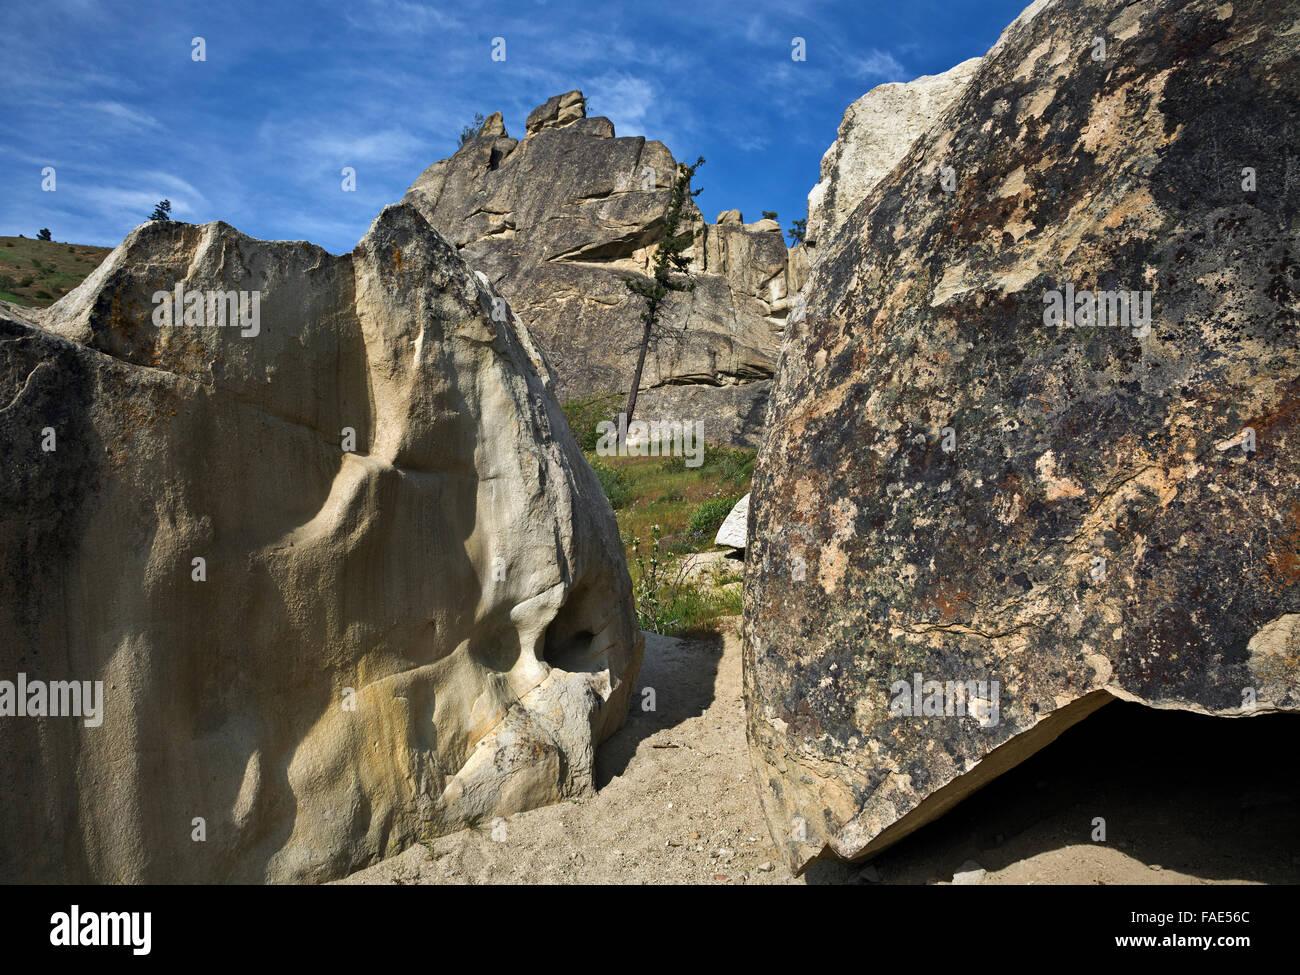 WA12467-00...WASHINGTON - The Pinnacles at Peshastin Pinnacles State Park, a popular rock climbing area near Cashmere. - Stock Image